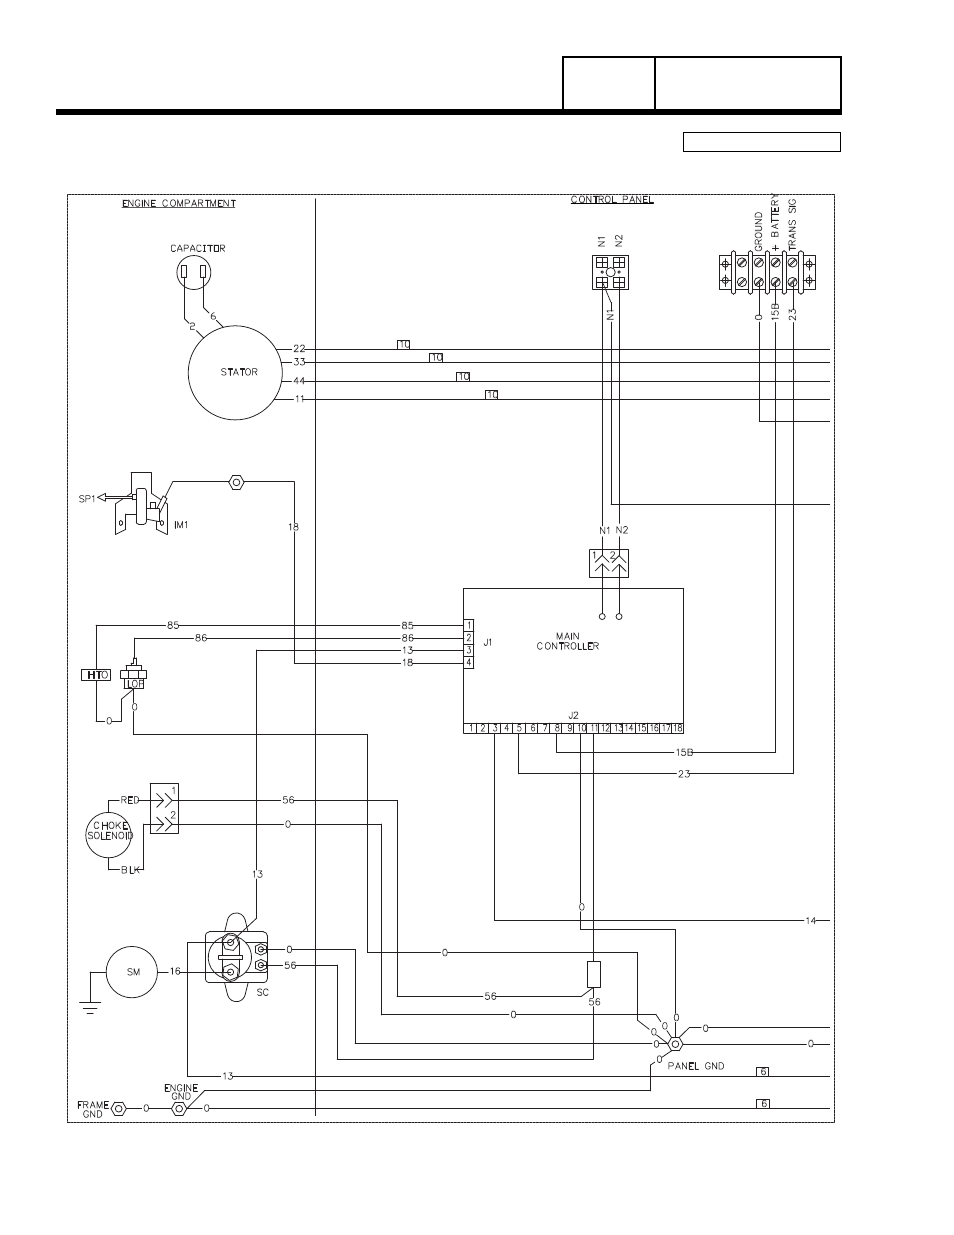 generac 6500e generator wiring diagram generac guardian